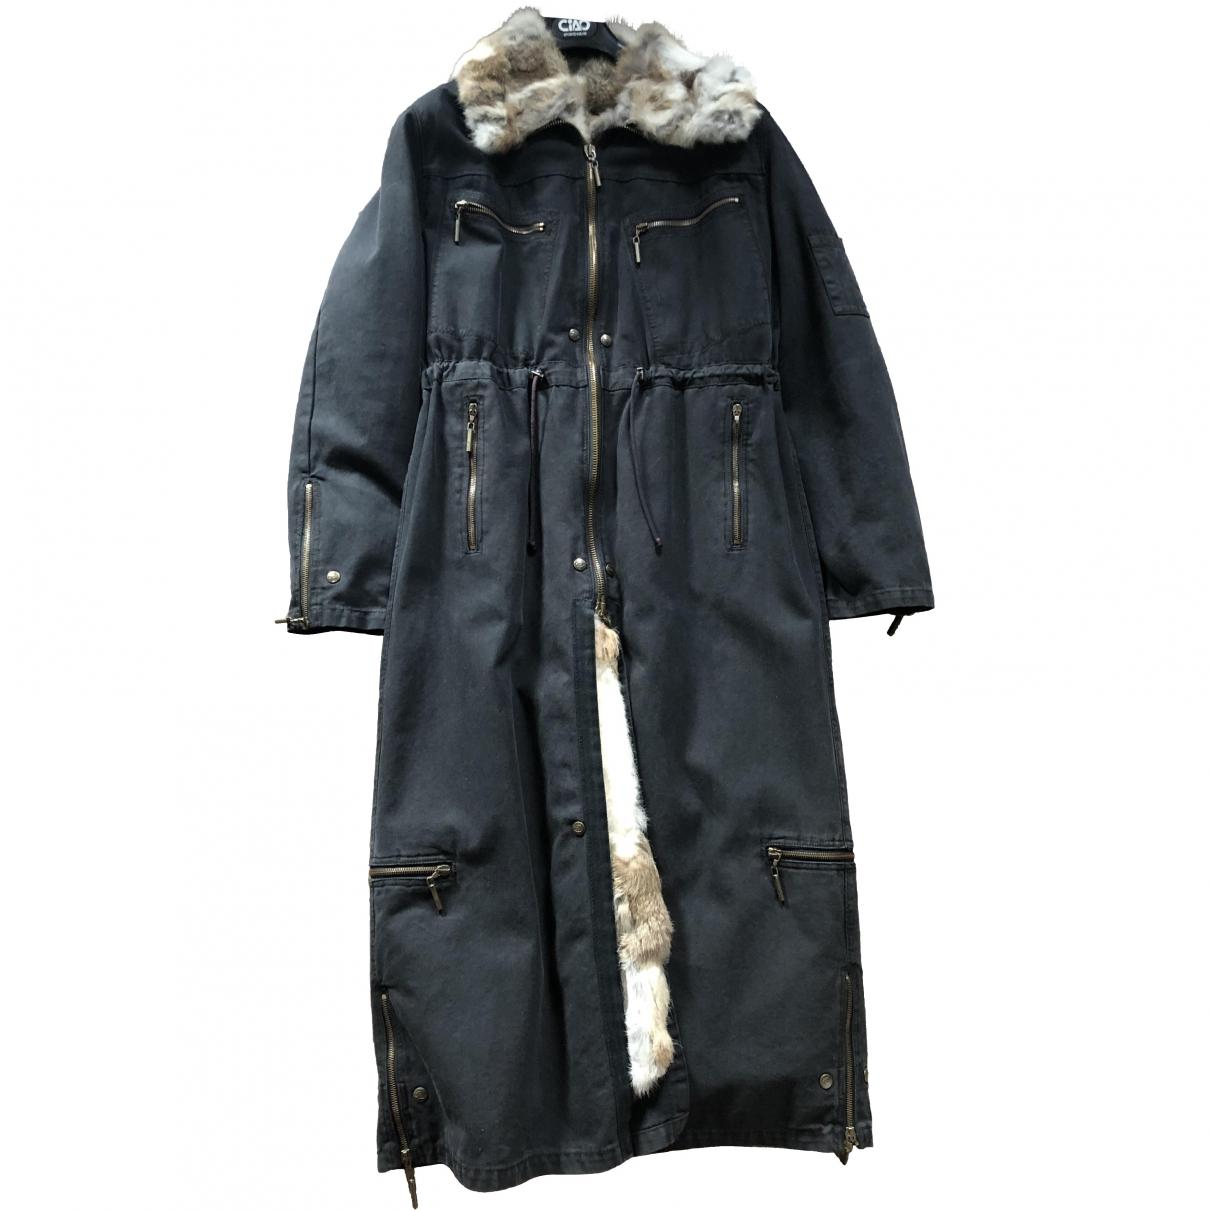 Just Cavalli \N Blue Denim - Jeans coat for Women 44 IT